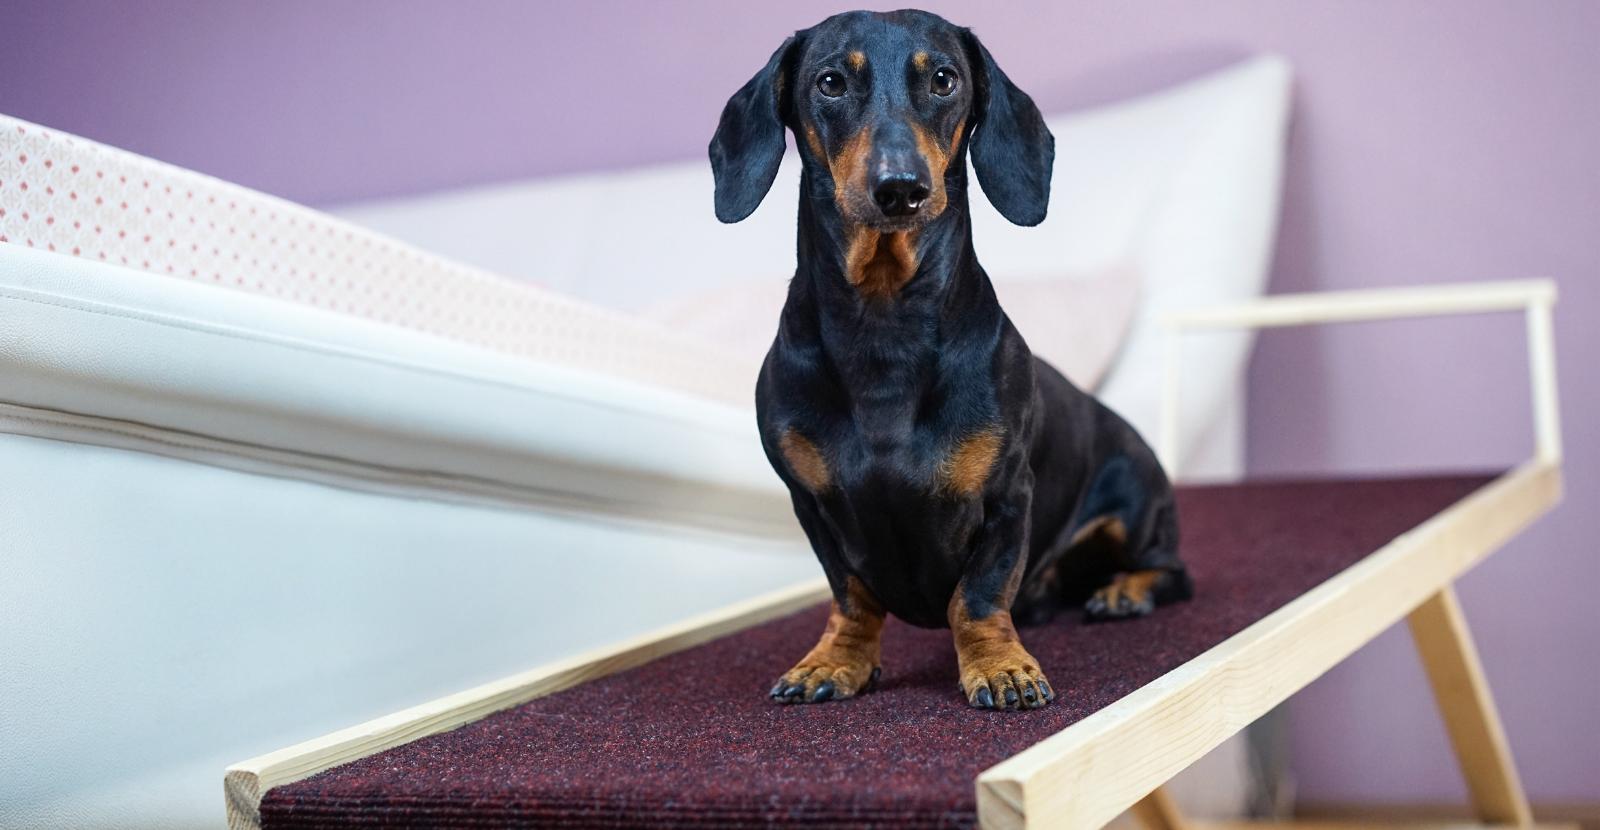 dog using ramp at home